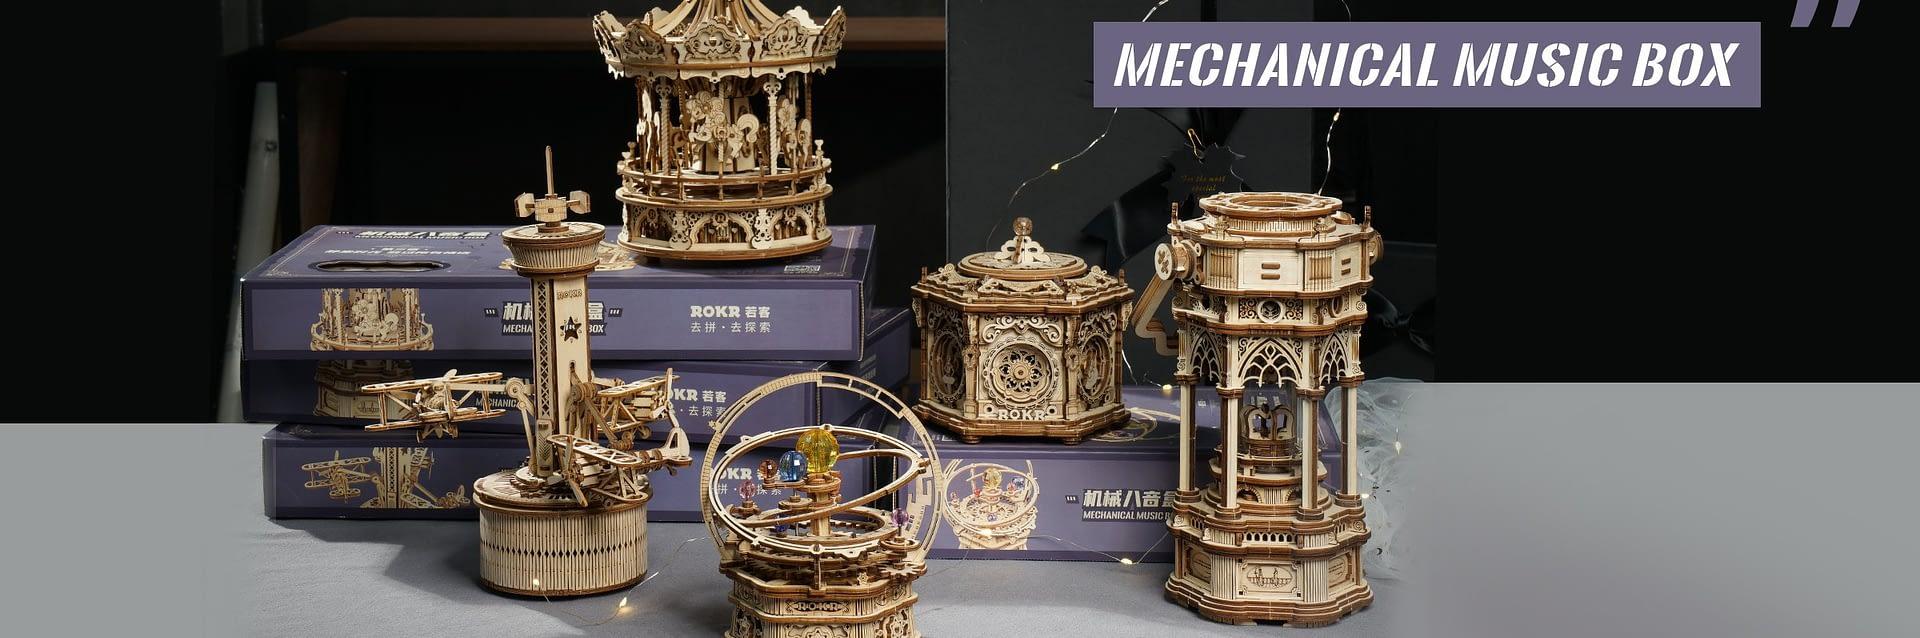 DIY Mechanical Music Box